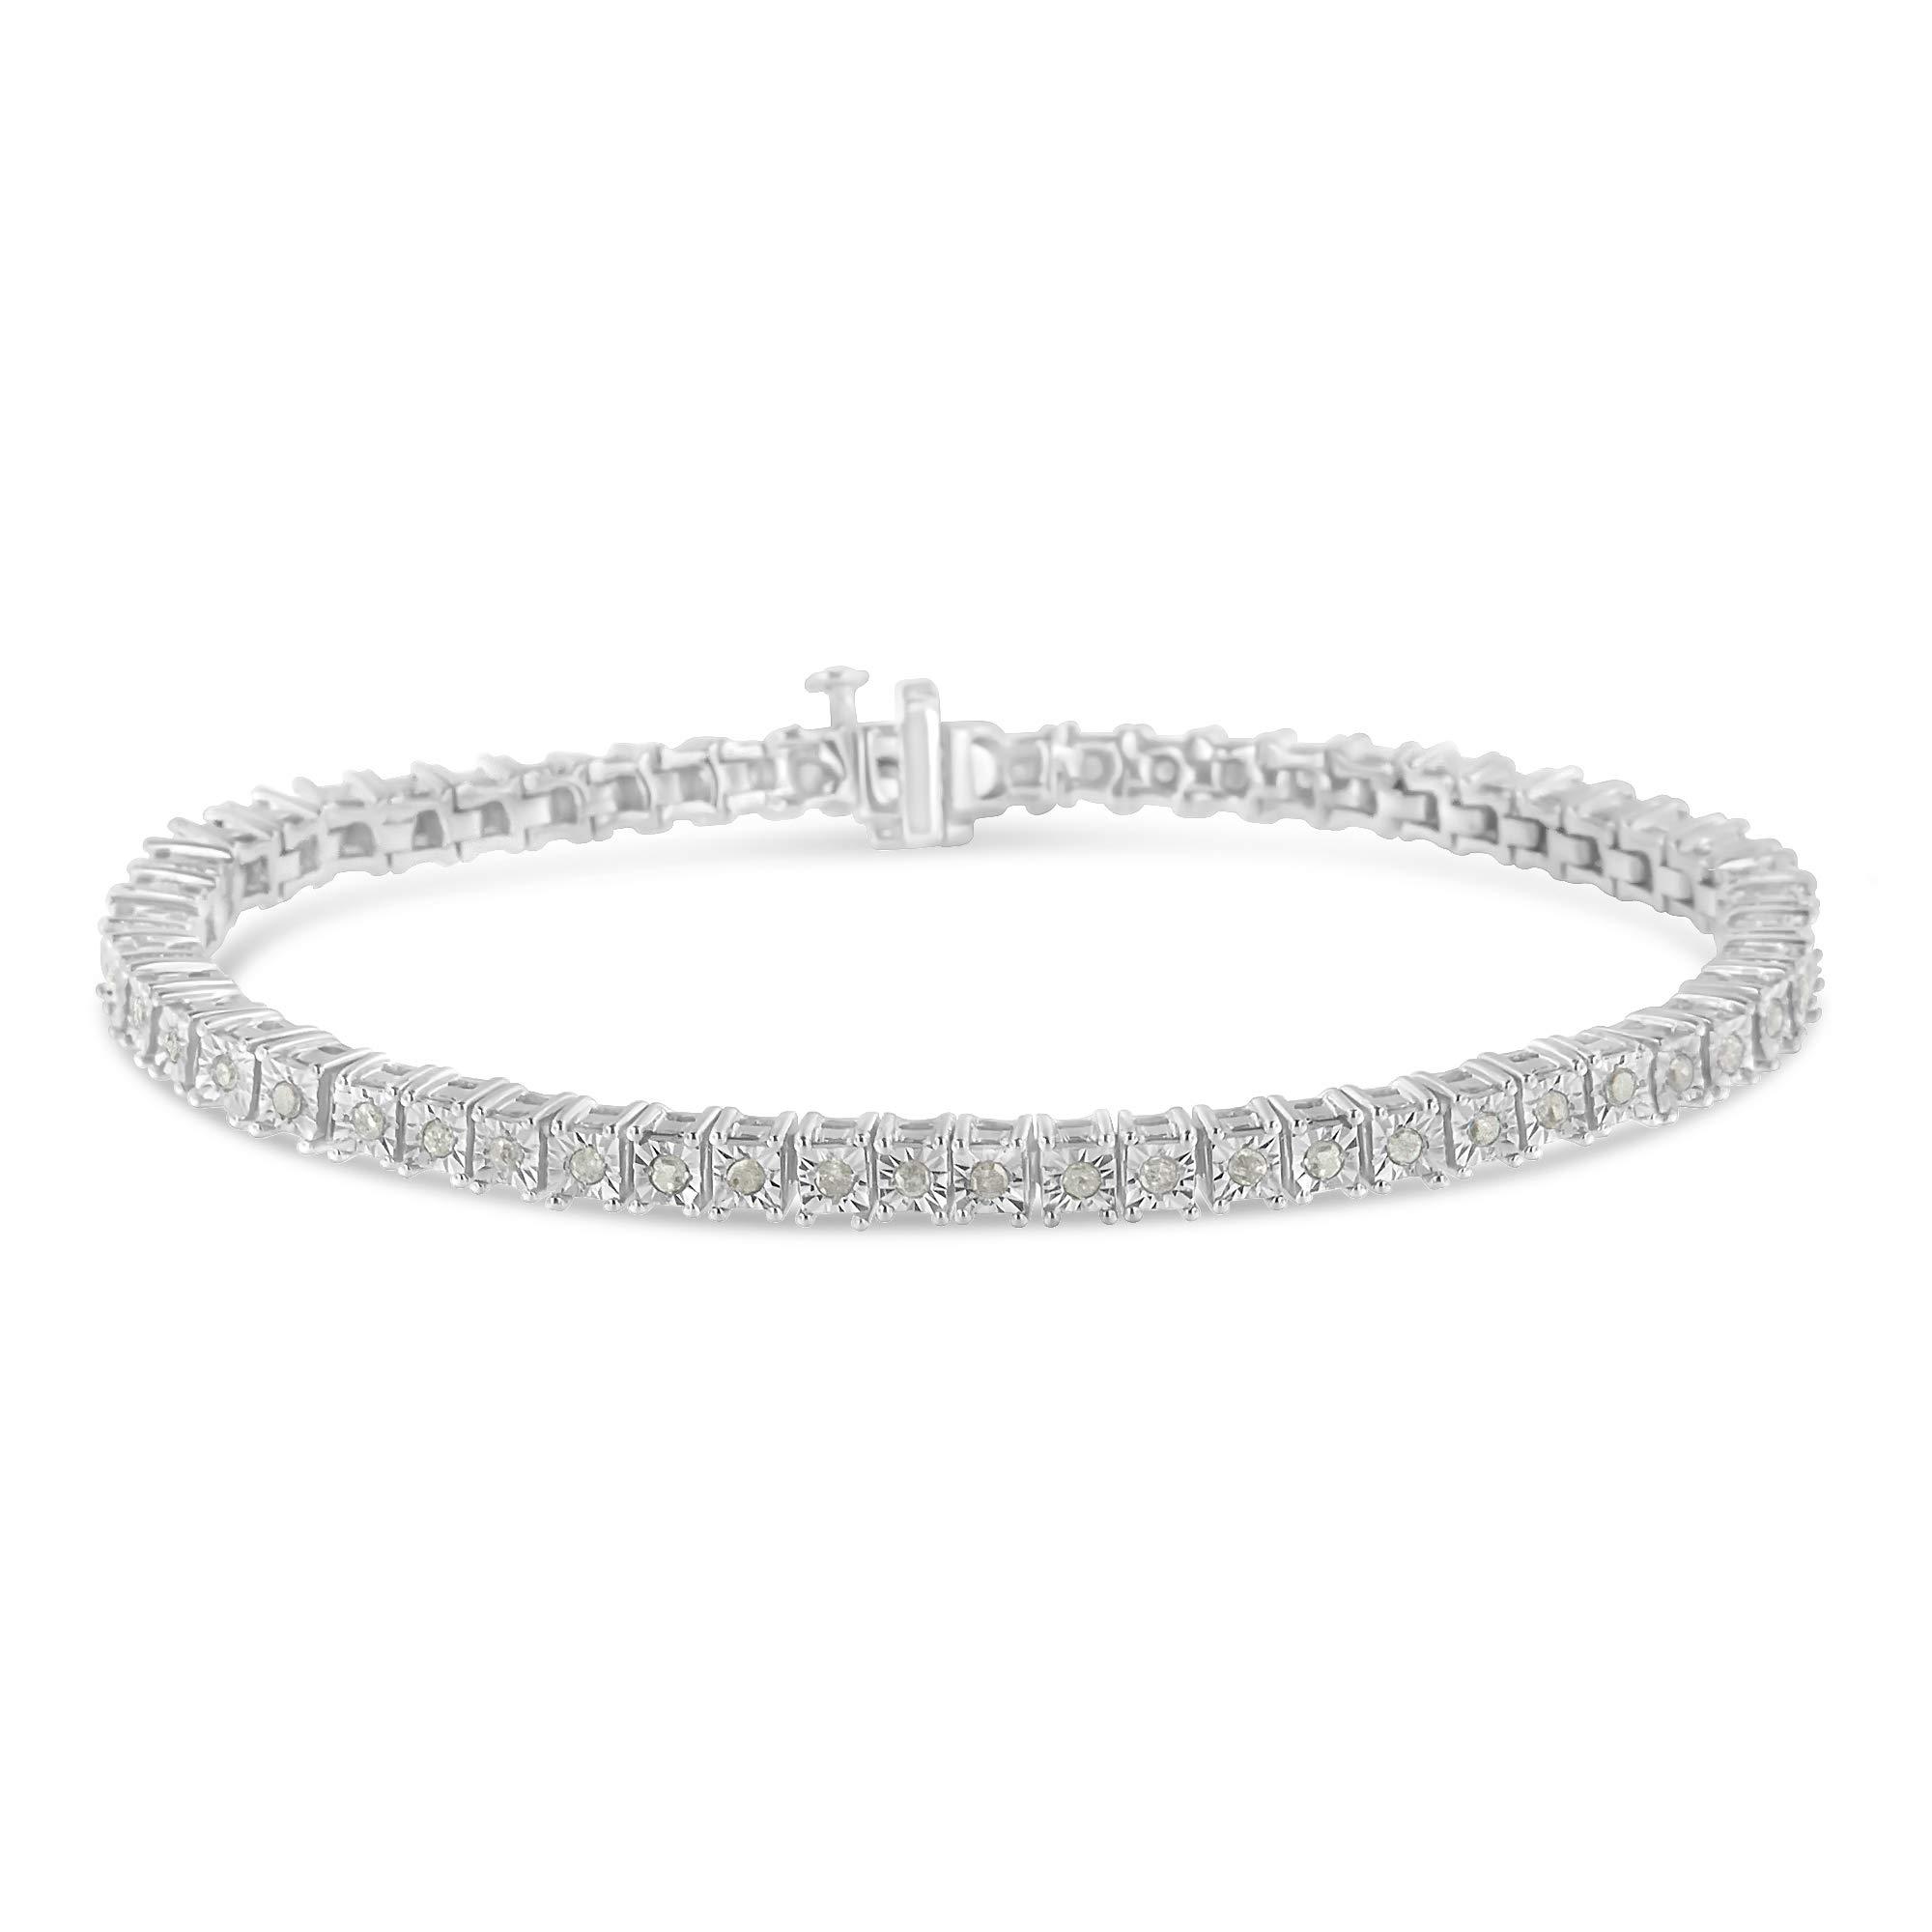 Original Classics 1.0 Ct Rose-Cut Square Frame Diamond Tennis Bracelet - Flawless Style with Brilliant Shine by Original Classics